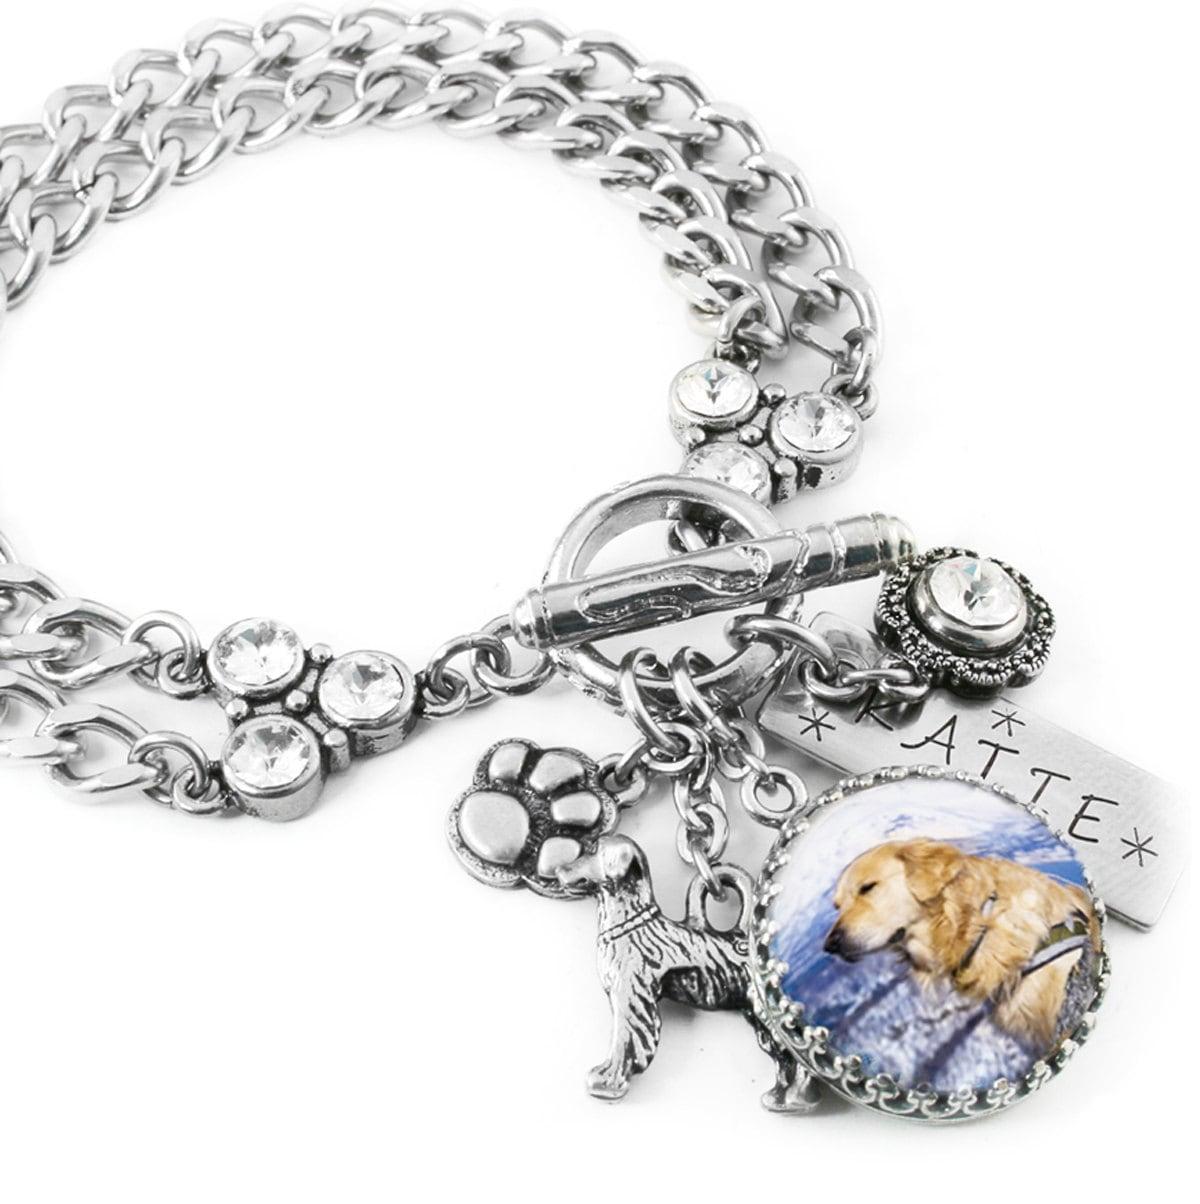 personalized dog jewelry dog charm bracelet personalized. Black Bedroom Furniture Sets. Home Design Ideas